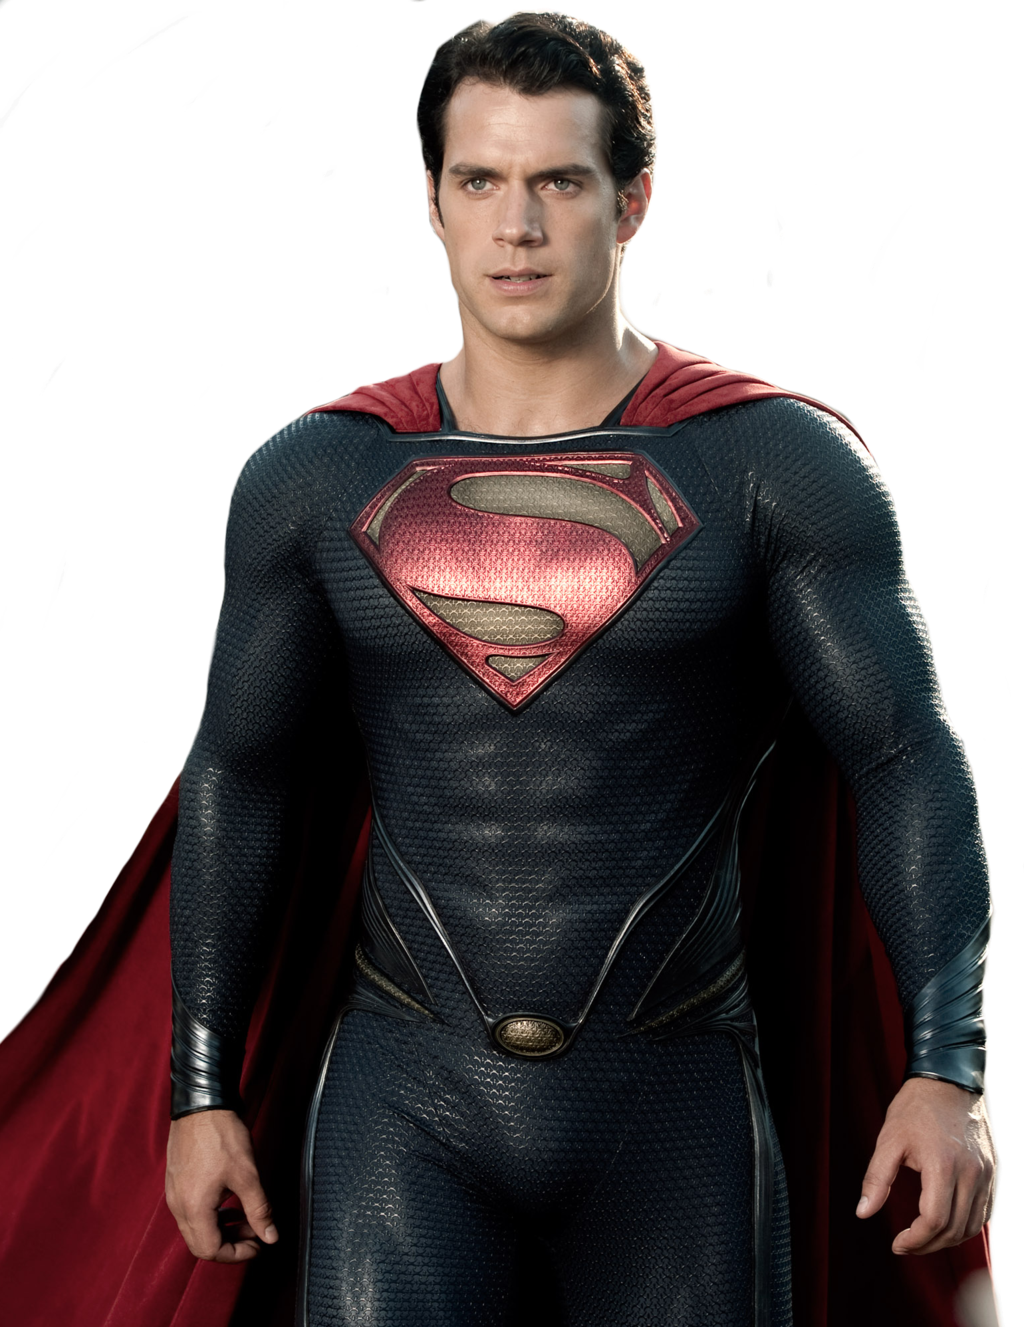 Superman Transparent By Asthonx1 Superman Man Of Steel Man Of Steel Superman